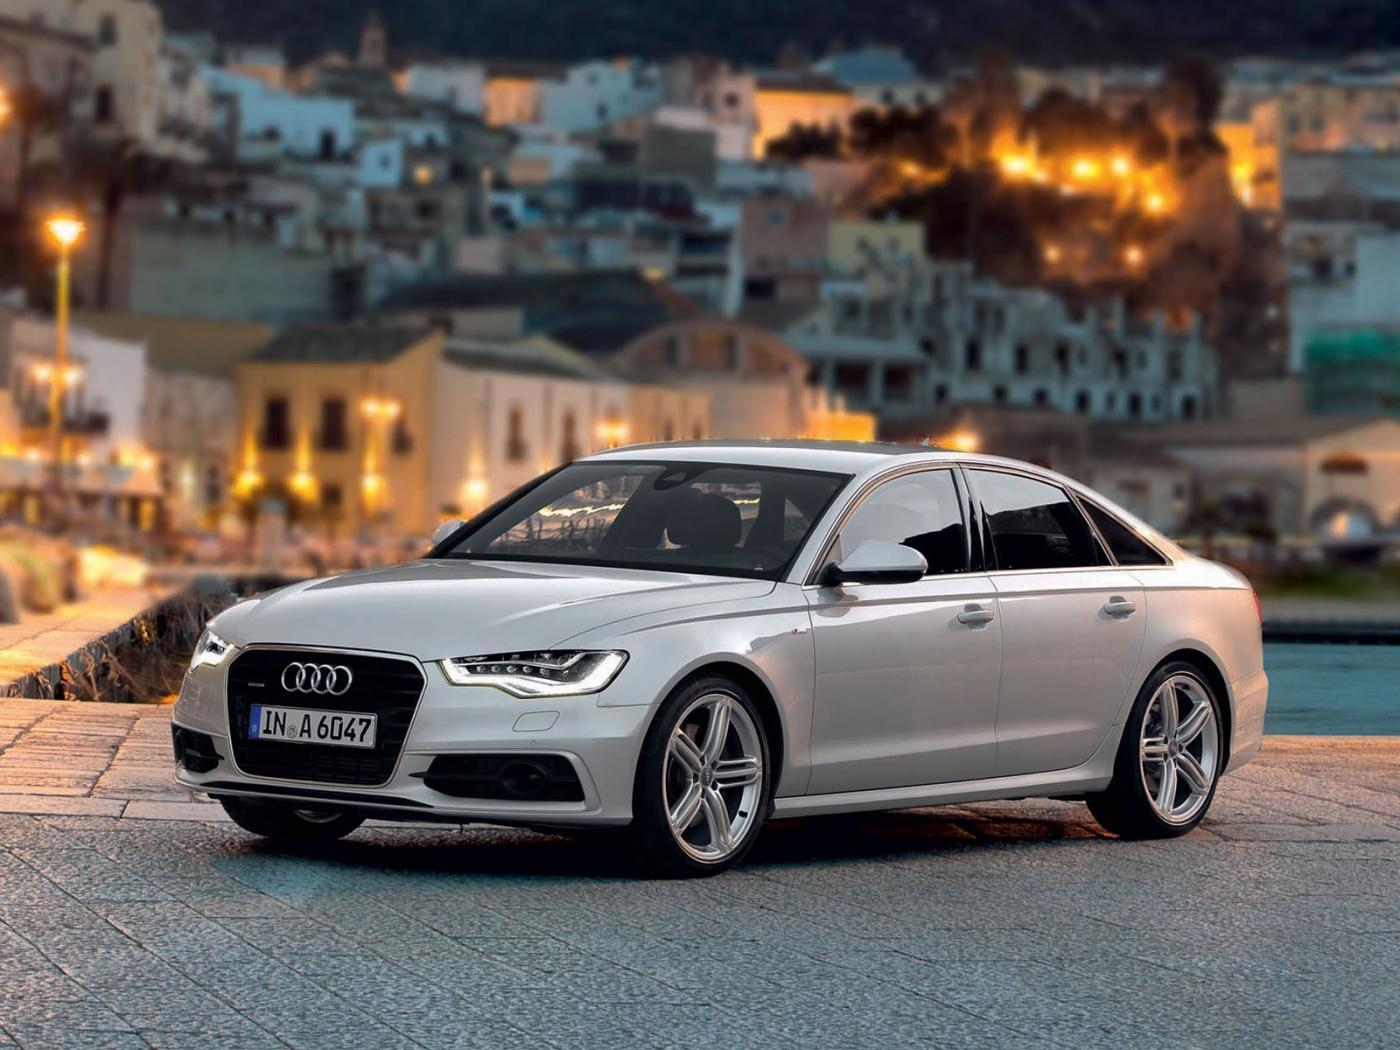 Audi-A6-C7-4